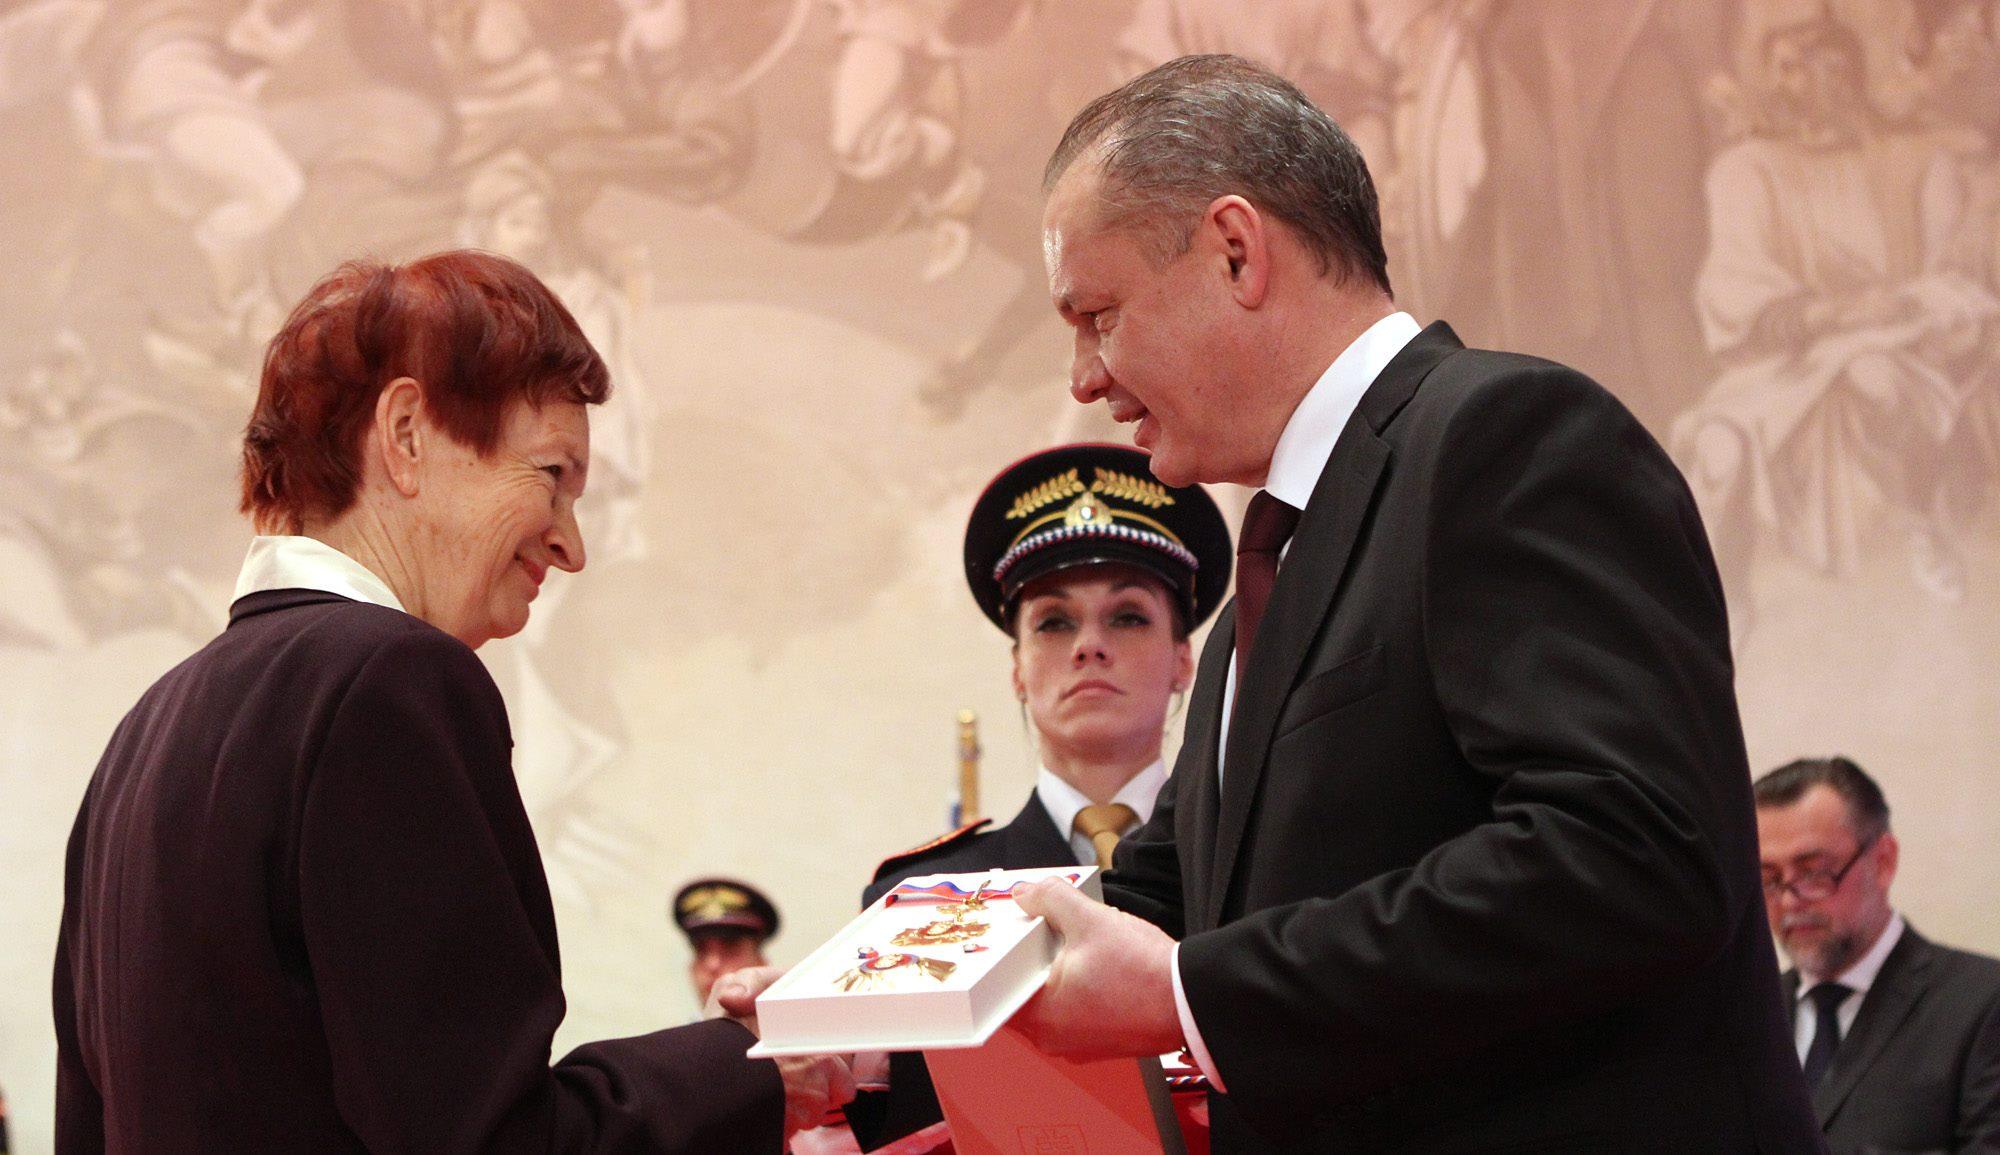 Soňa Szomolányi, Andrej Kiska, 07/01/16, Bratislavský hrad,©prezident.sk